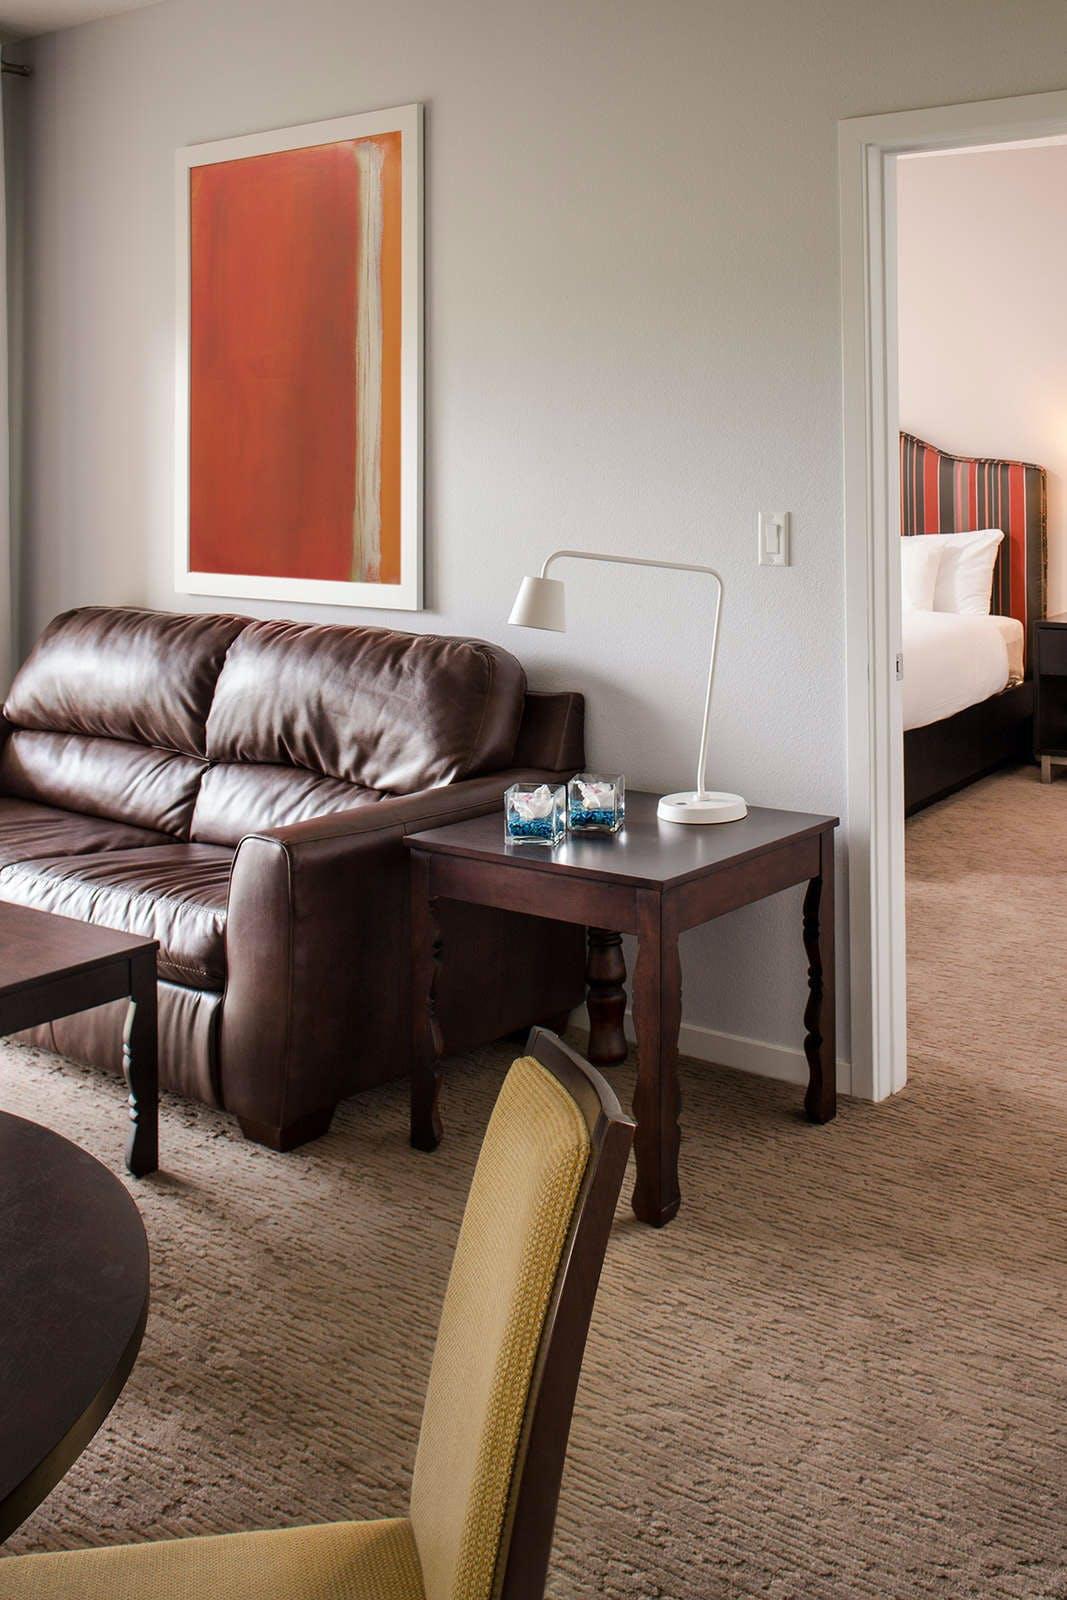 Melia Orlando Suites Hotel